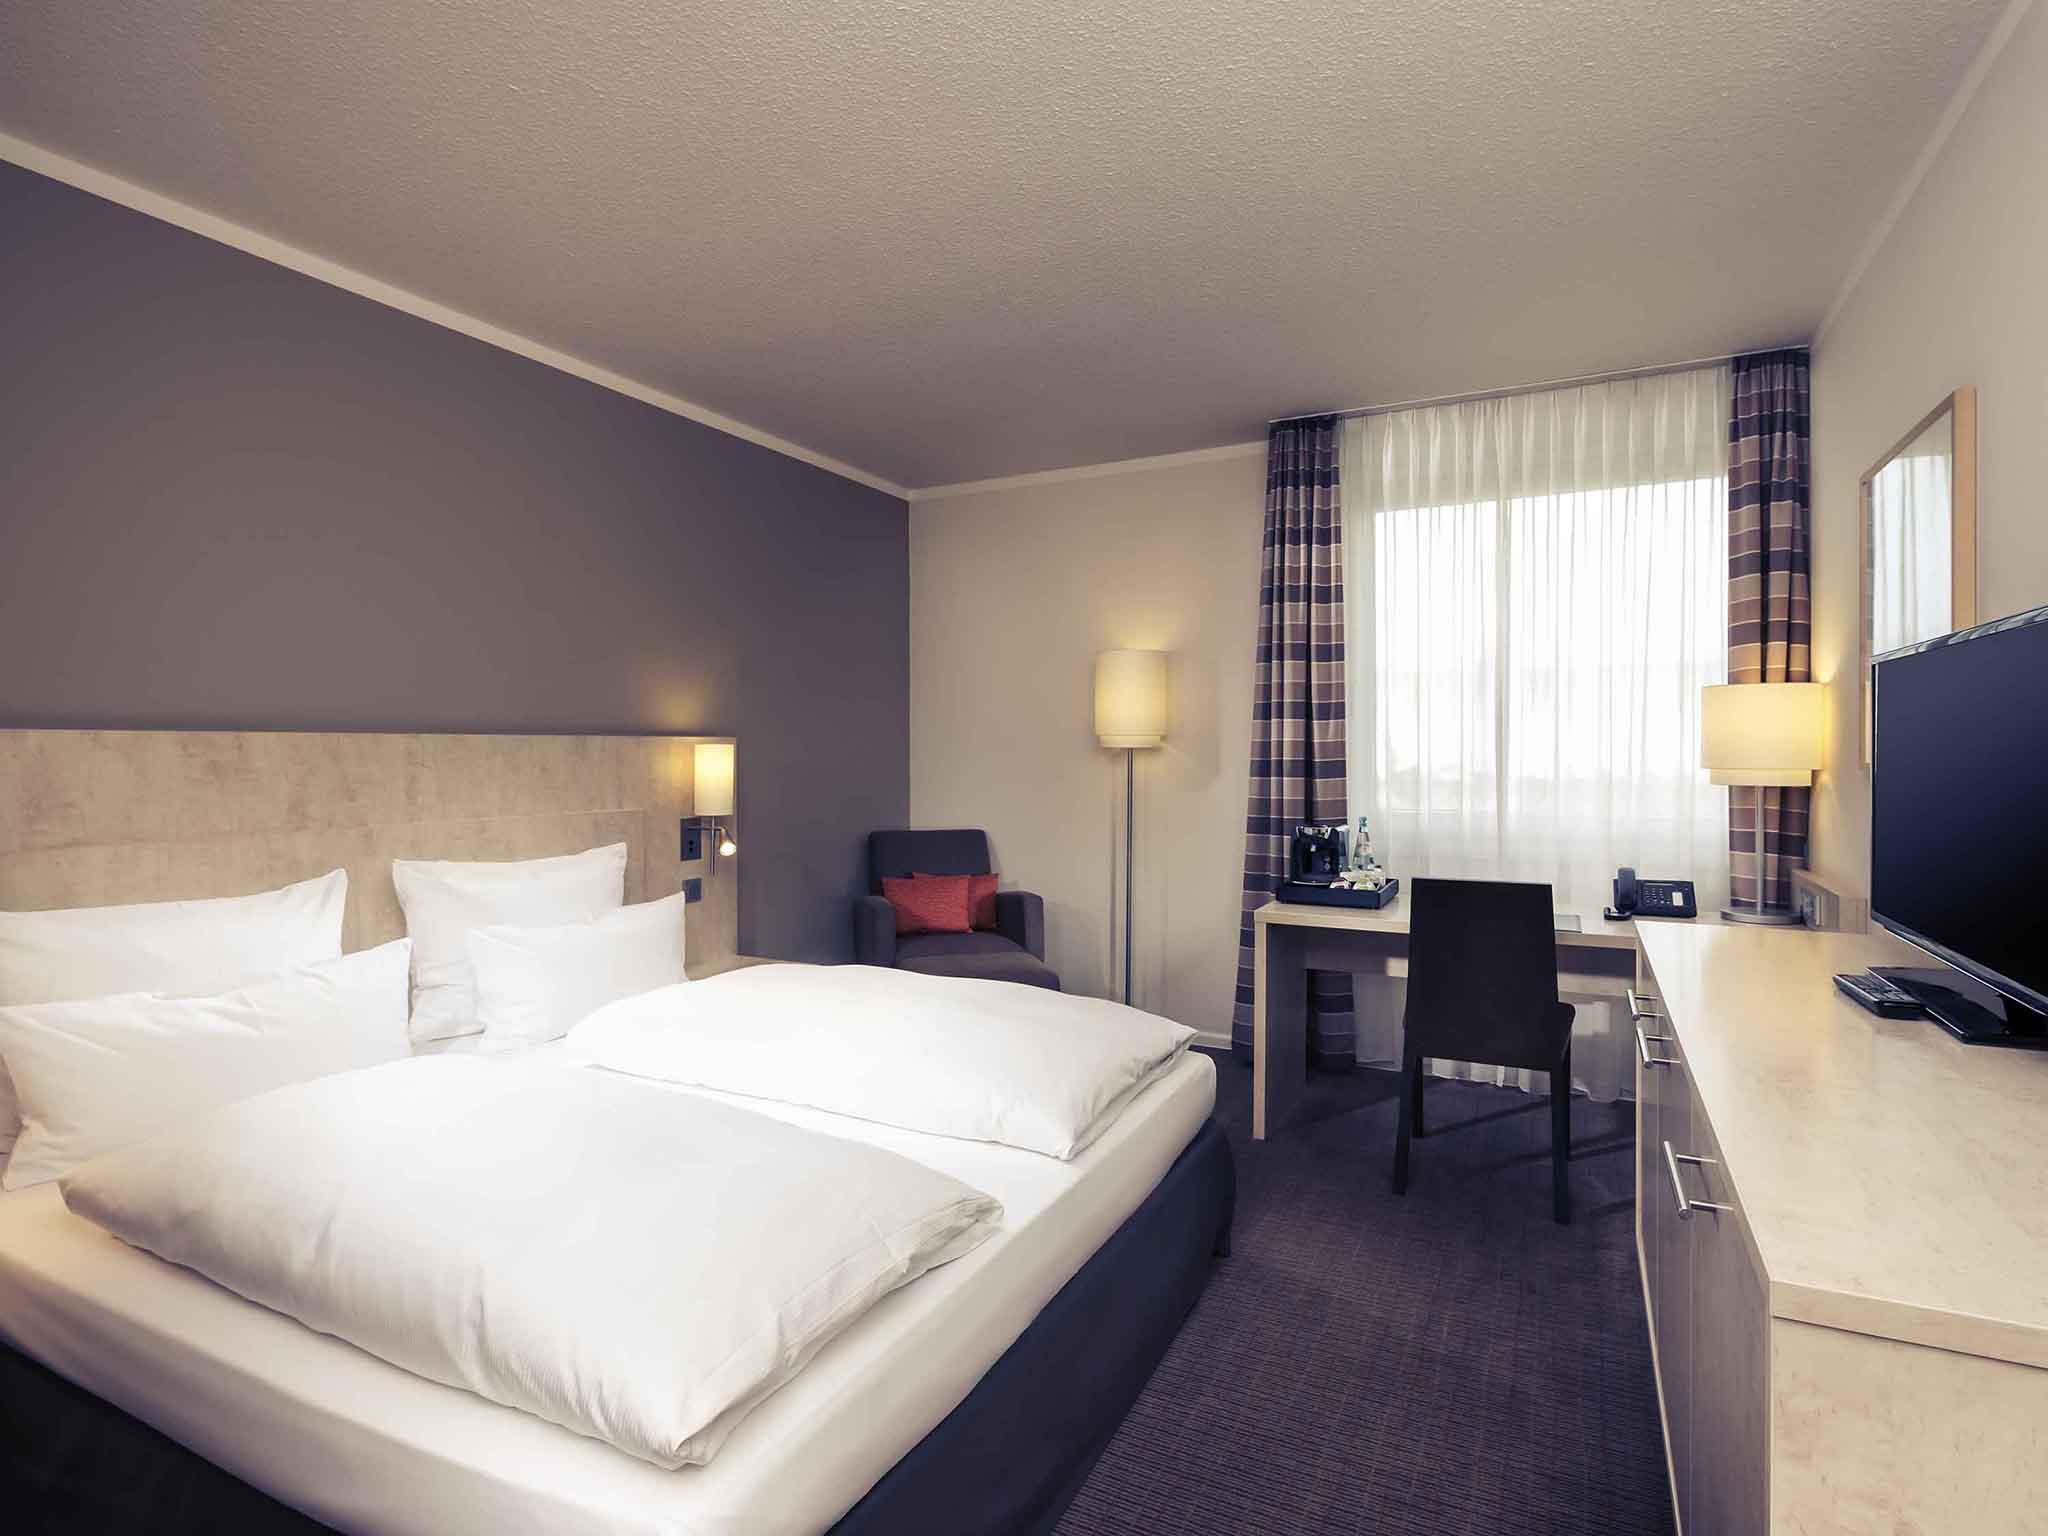 Hotel in DUESSELDORF - Mercure Hotel Duesseldorf Sued